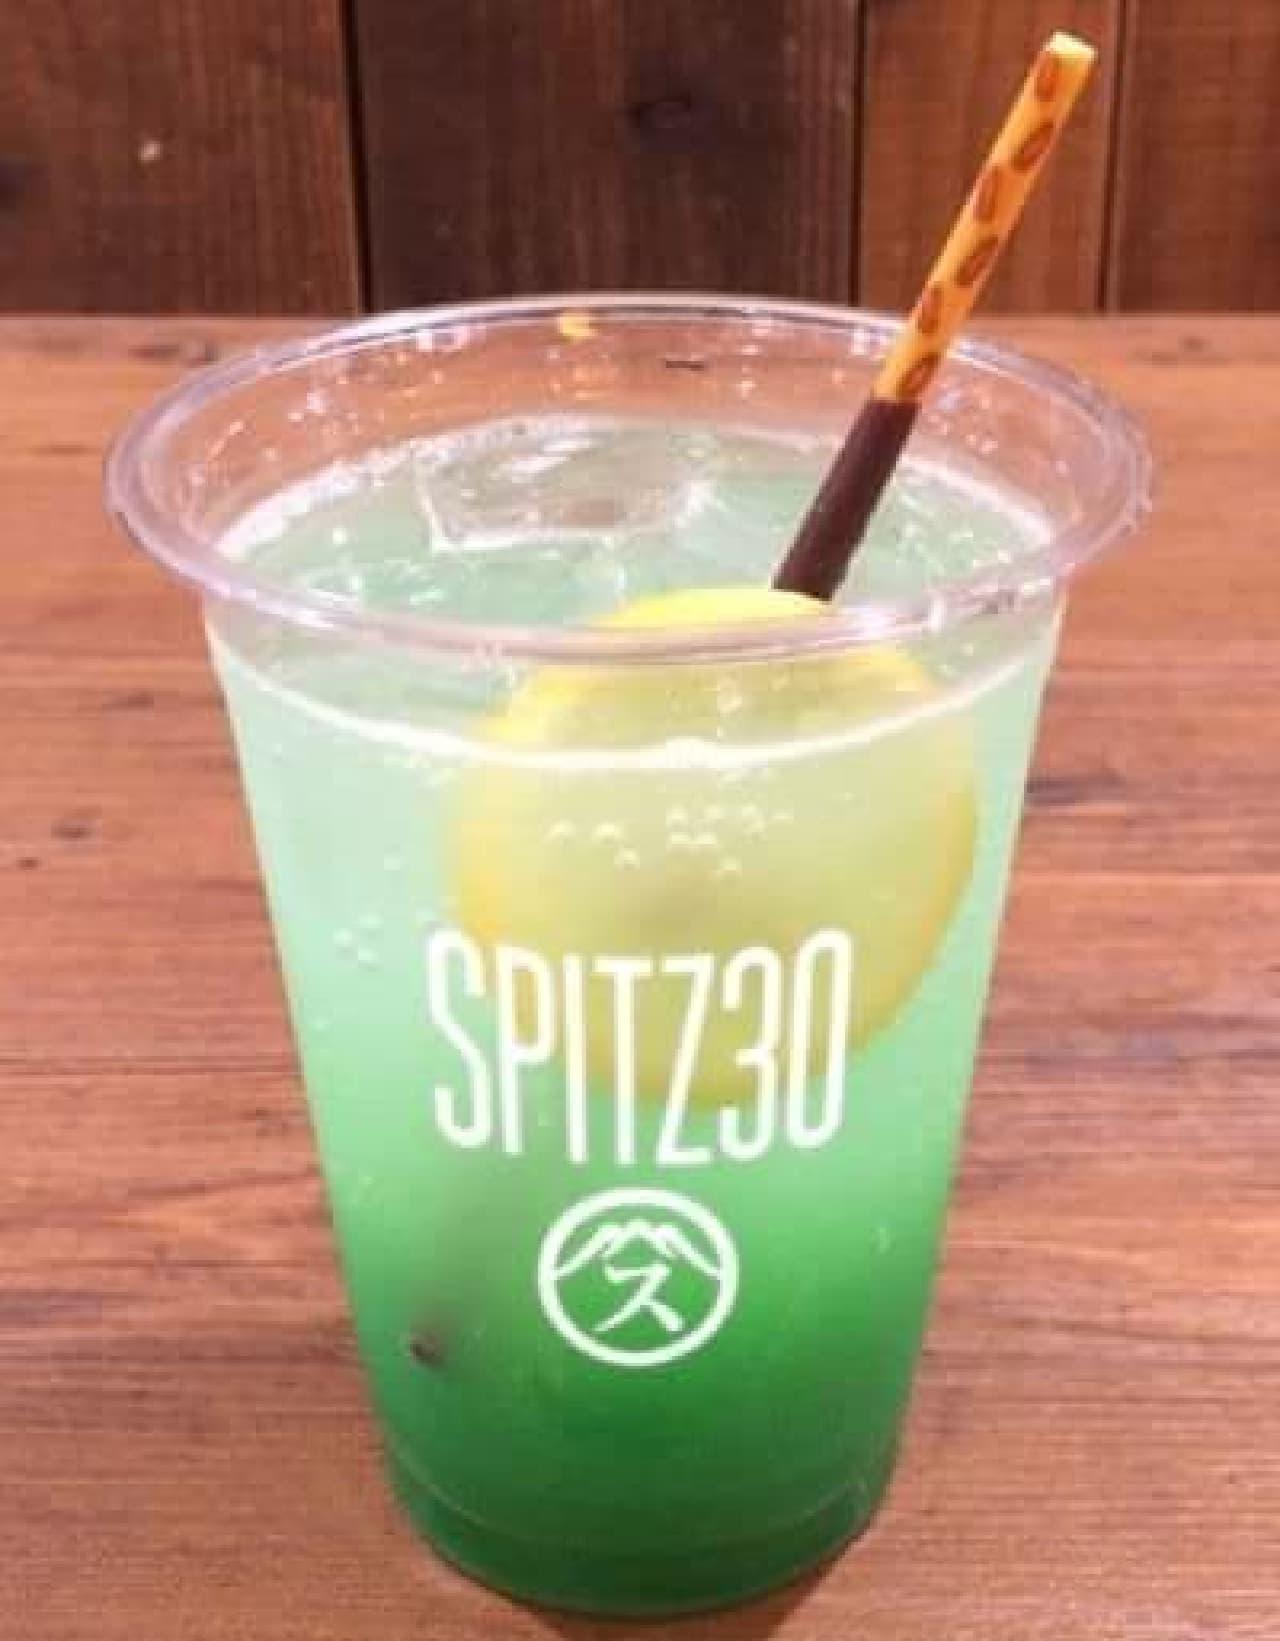 「SPITZ 30th ANNIVERSARY CAFE」は結成30周年を迎えるスピッツの全シングル集発売を記念して開催されるカフェ